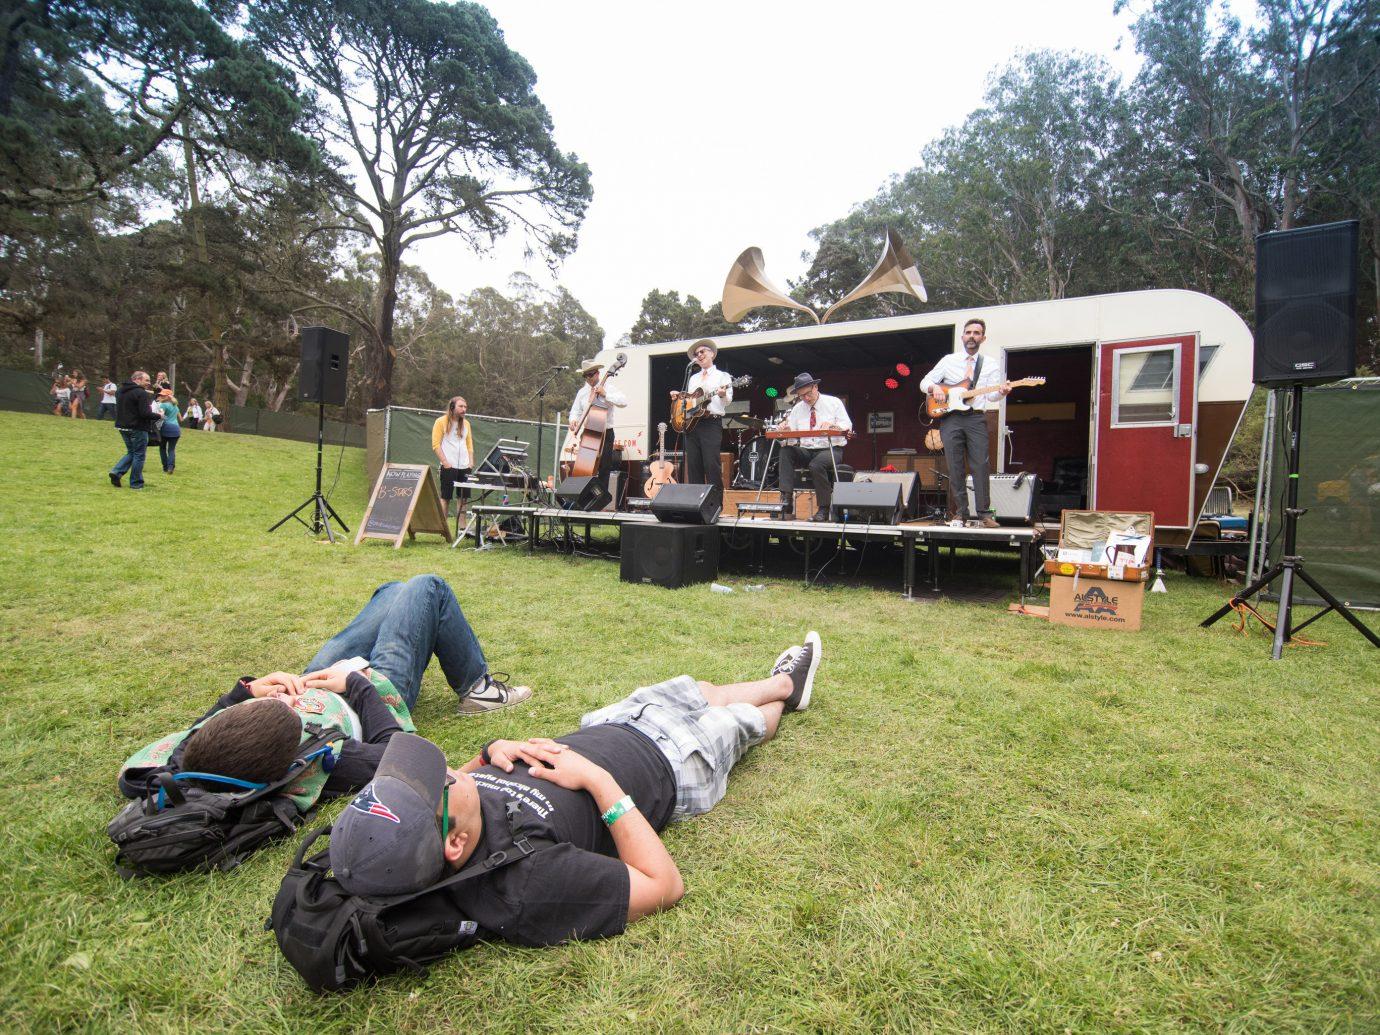 Arts + Culture grass tree outdoor endurance sports several